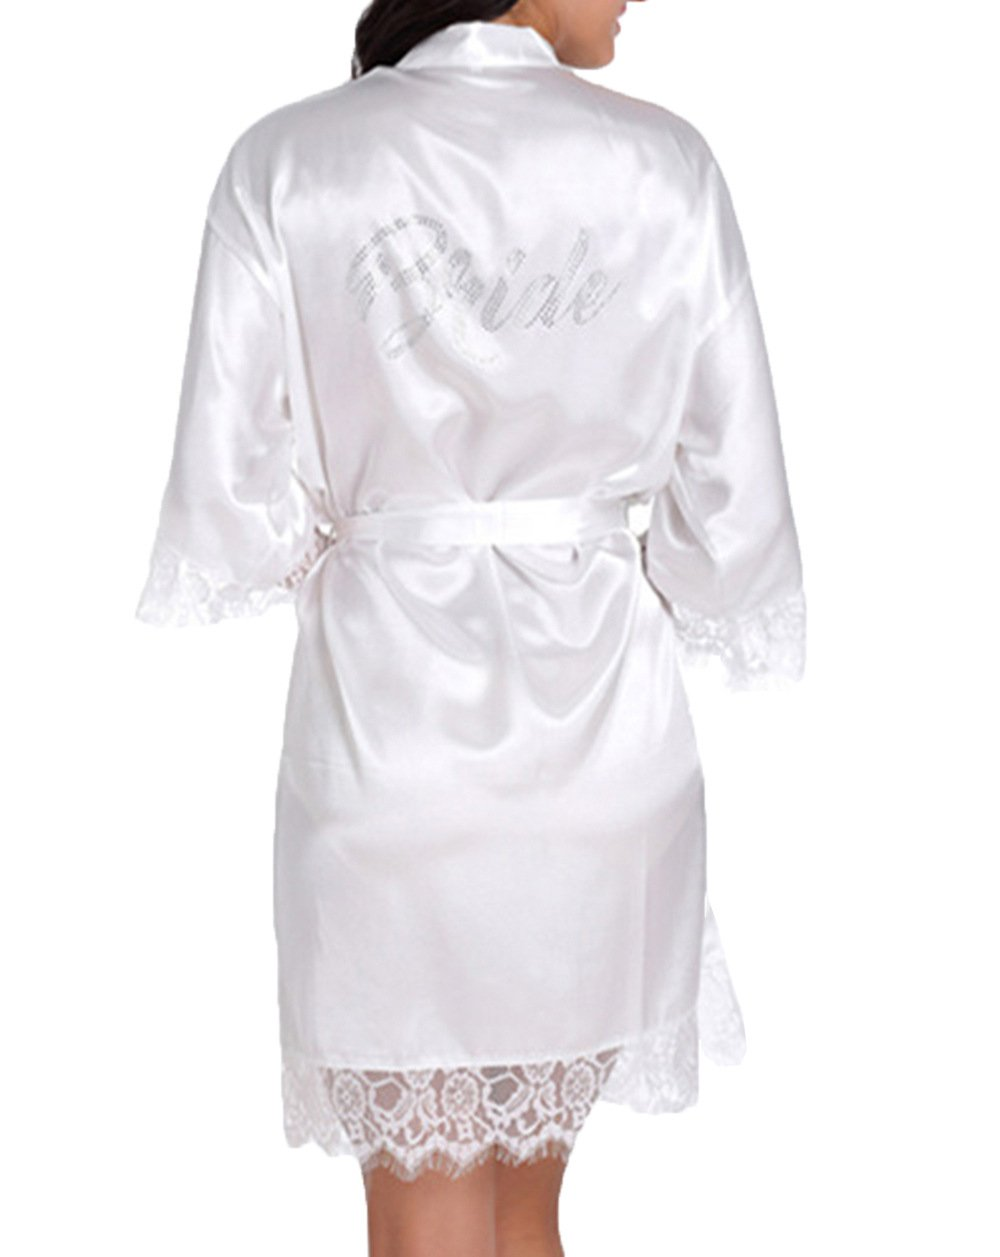 WPFING Bride Robes White Lace Bridal Party Robes Rhinestone Satin(Bride White,Large)